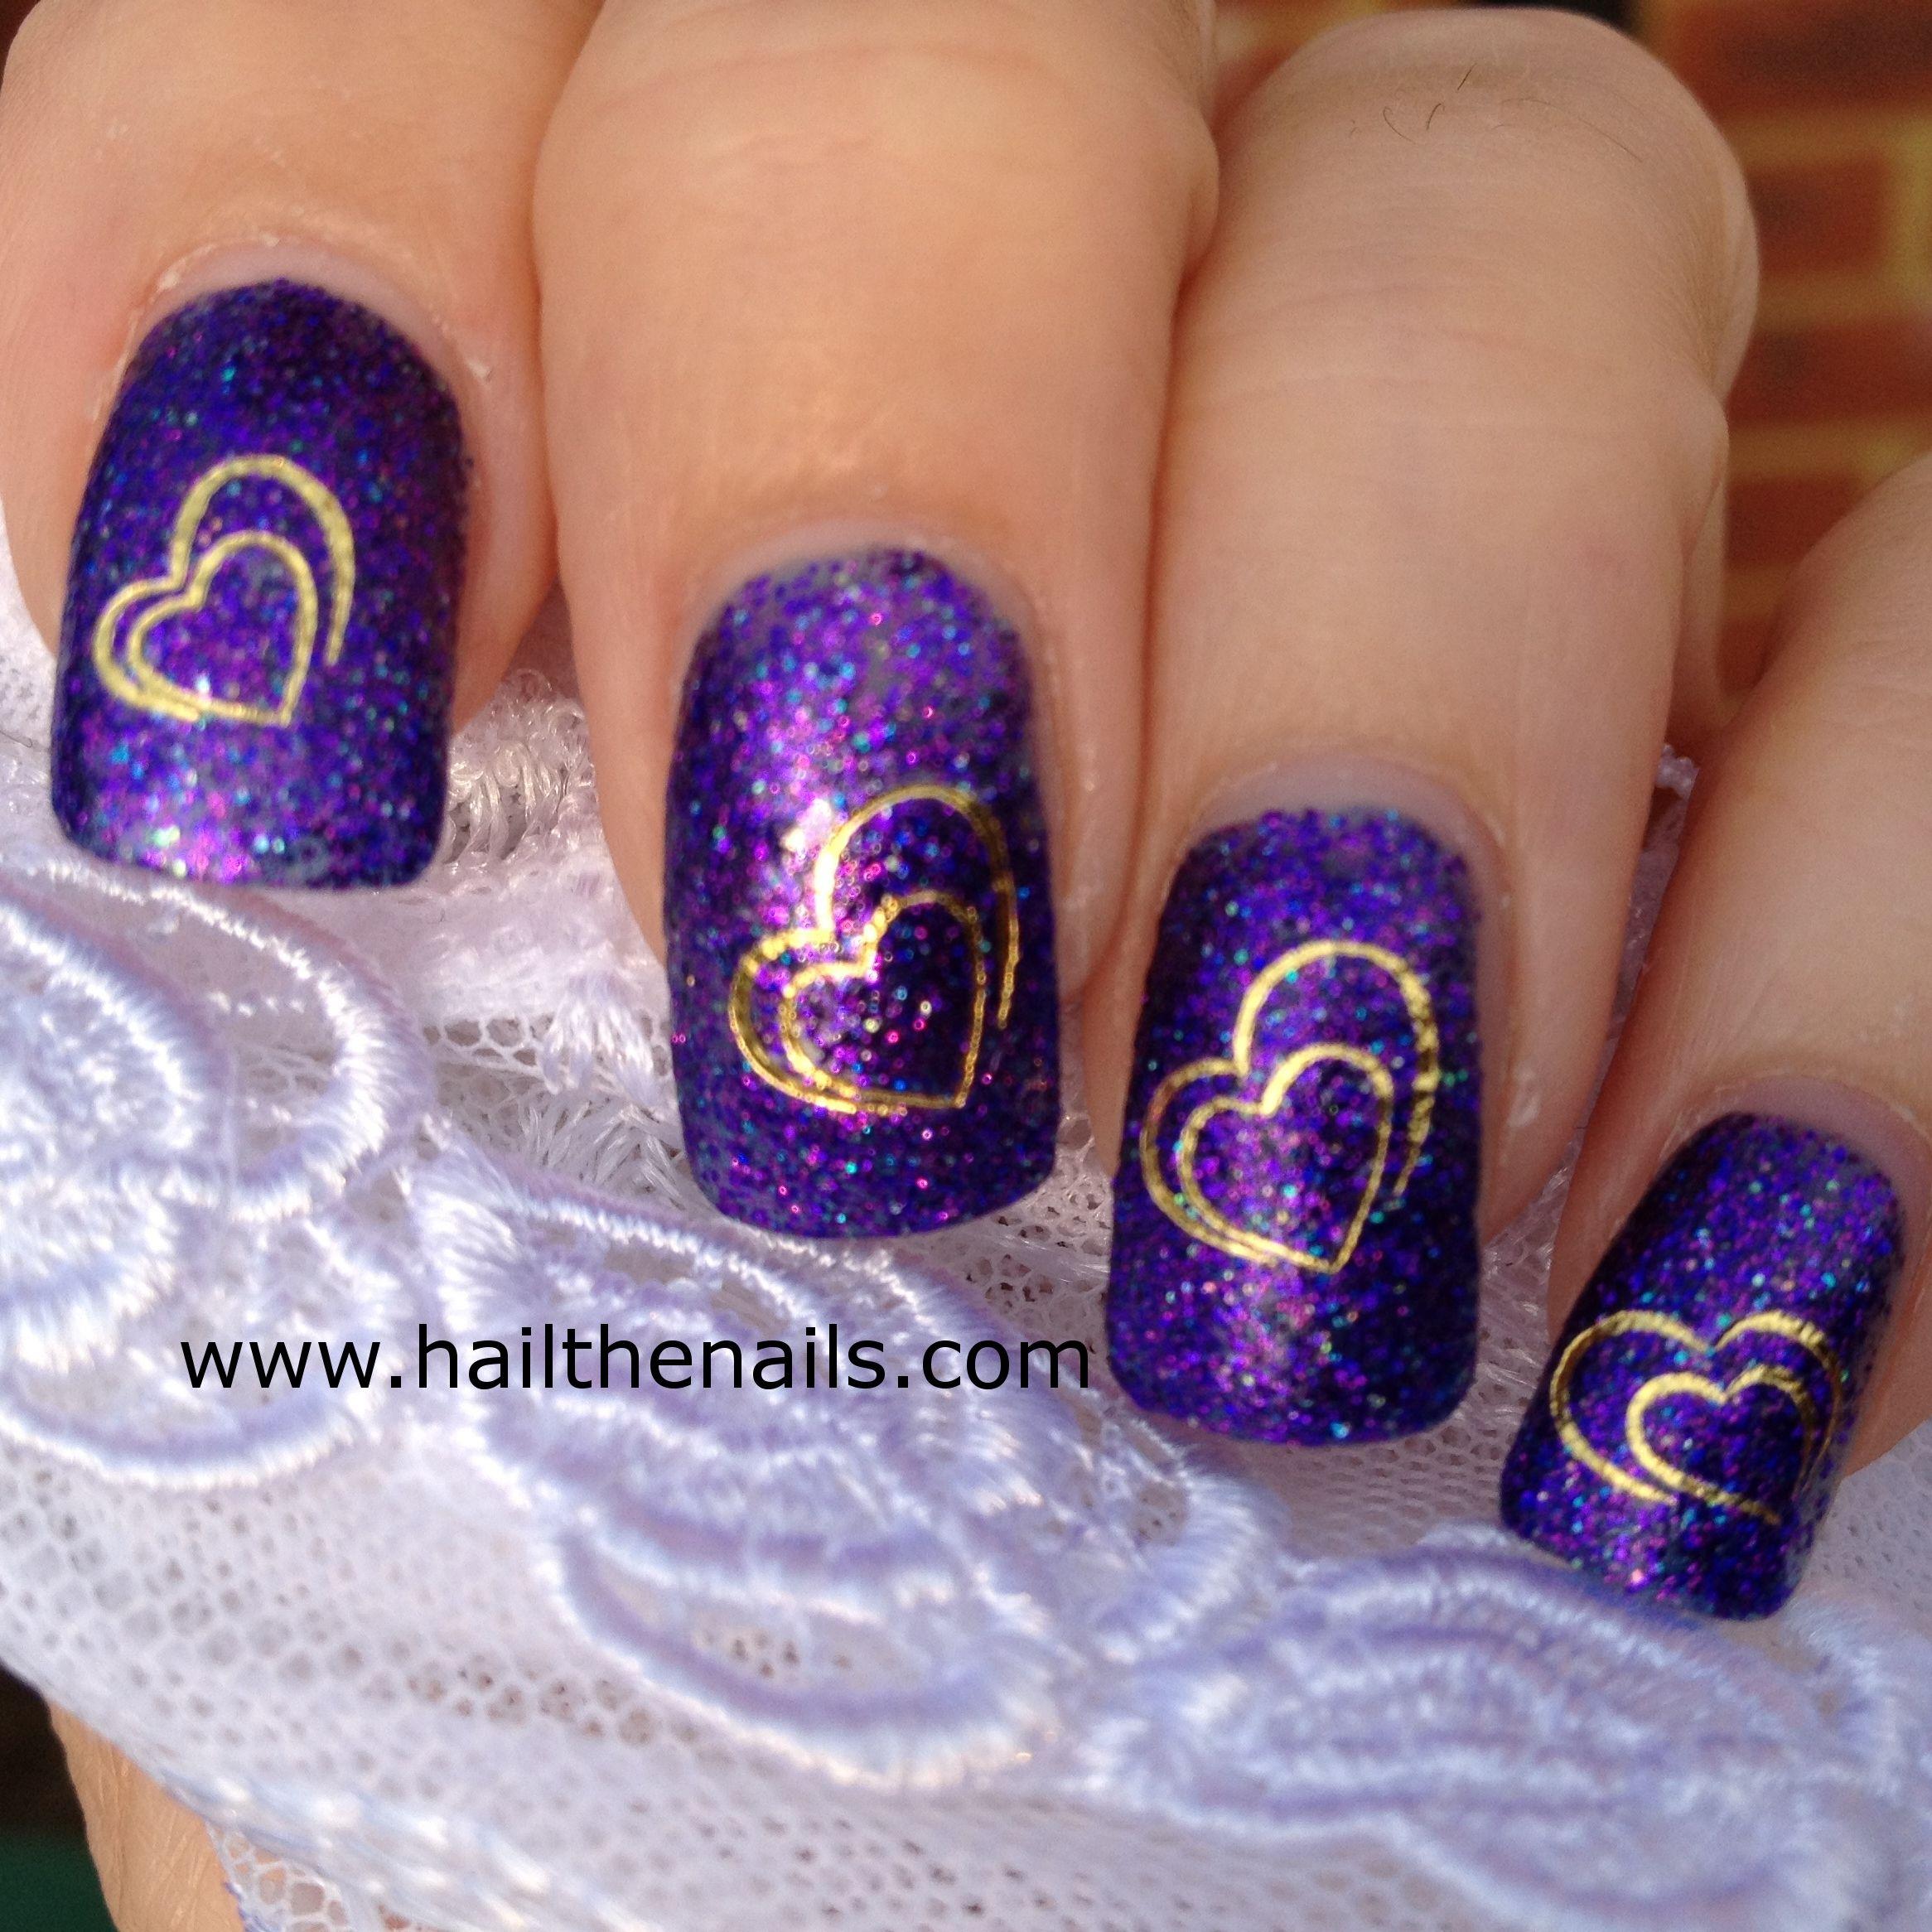 Cute hearts nail art design | Everything Nails | Pinterest | Makeup ...